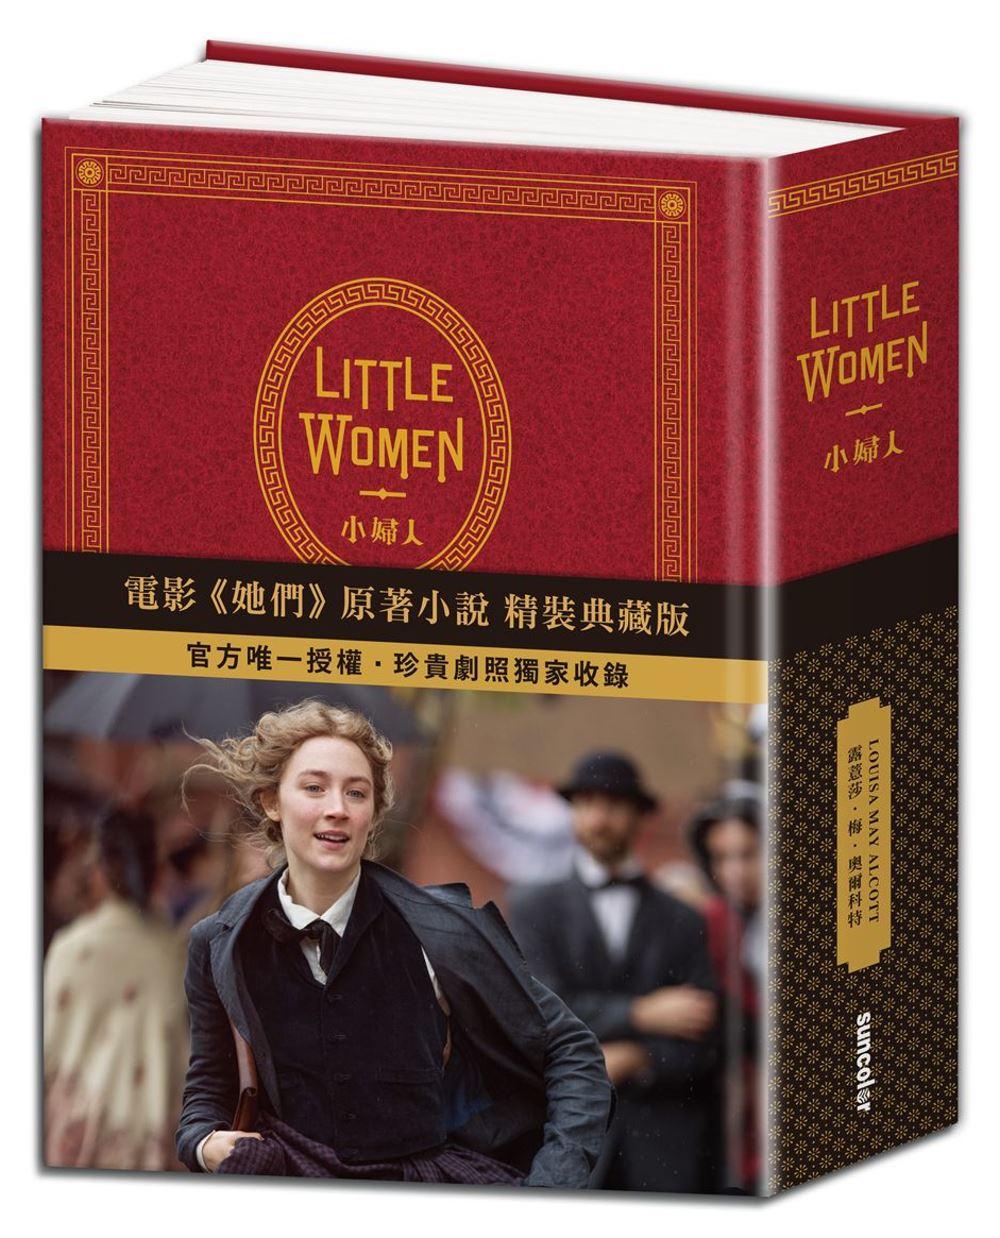 Little Women 小婦人:電影《她們》原著小說(150週年精裝典藏版 【33張官方劇照獨家收錄】)